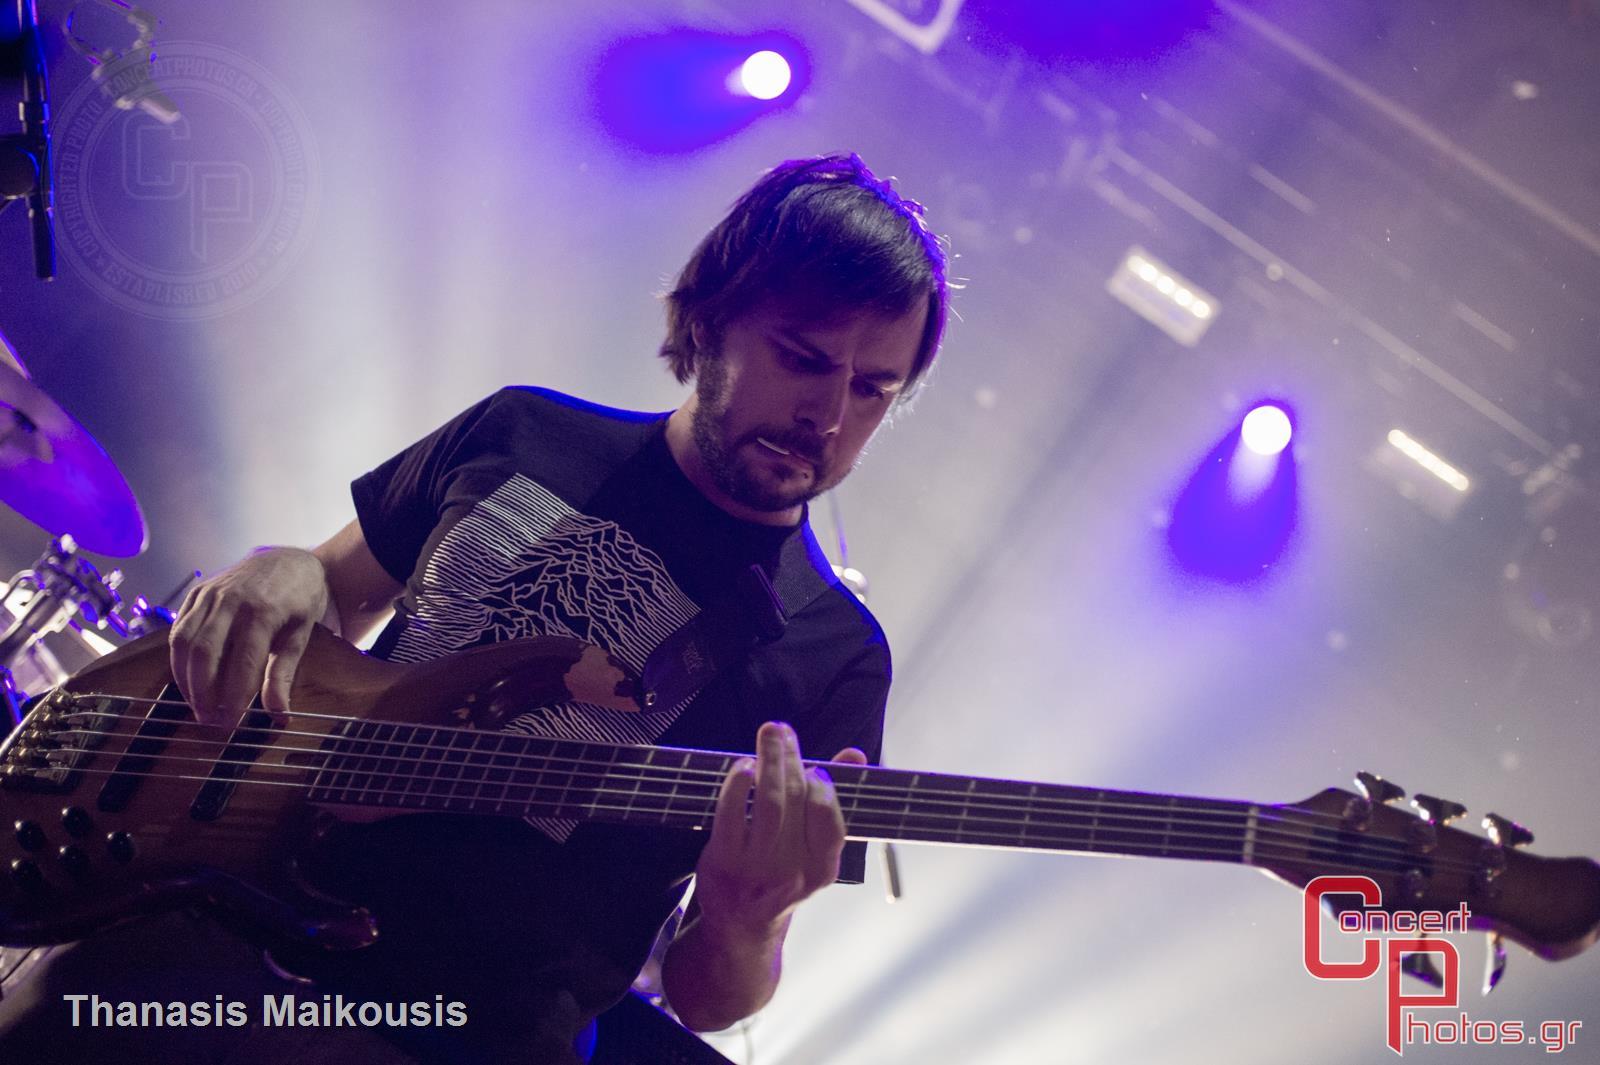 Tricky - Spectralfire-Tricky - Spectralfire photographer: Thanasis Maikousis - concertphotos_-3530